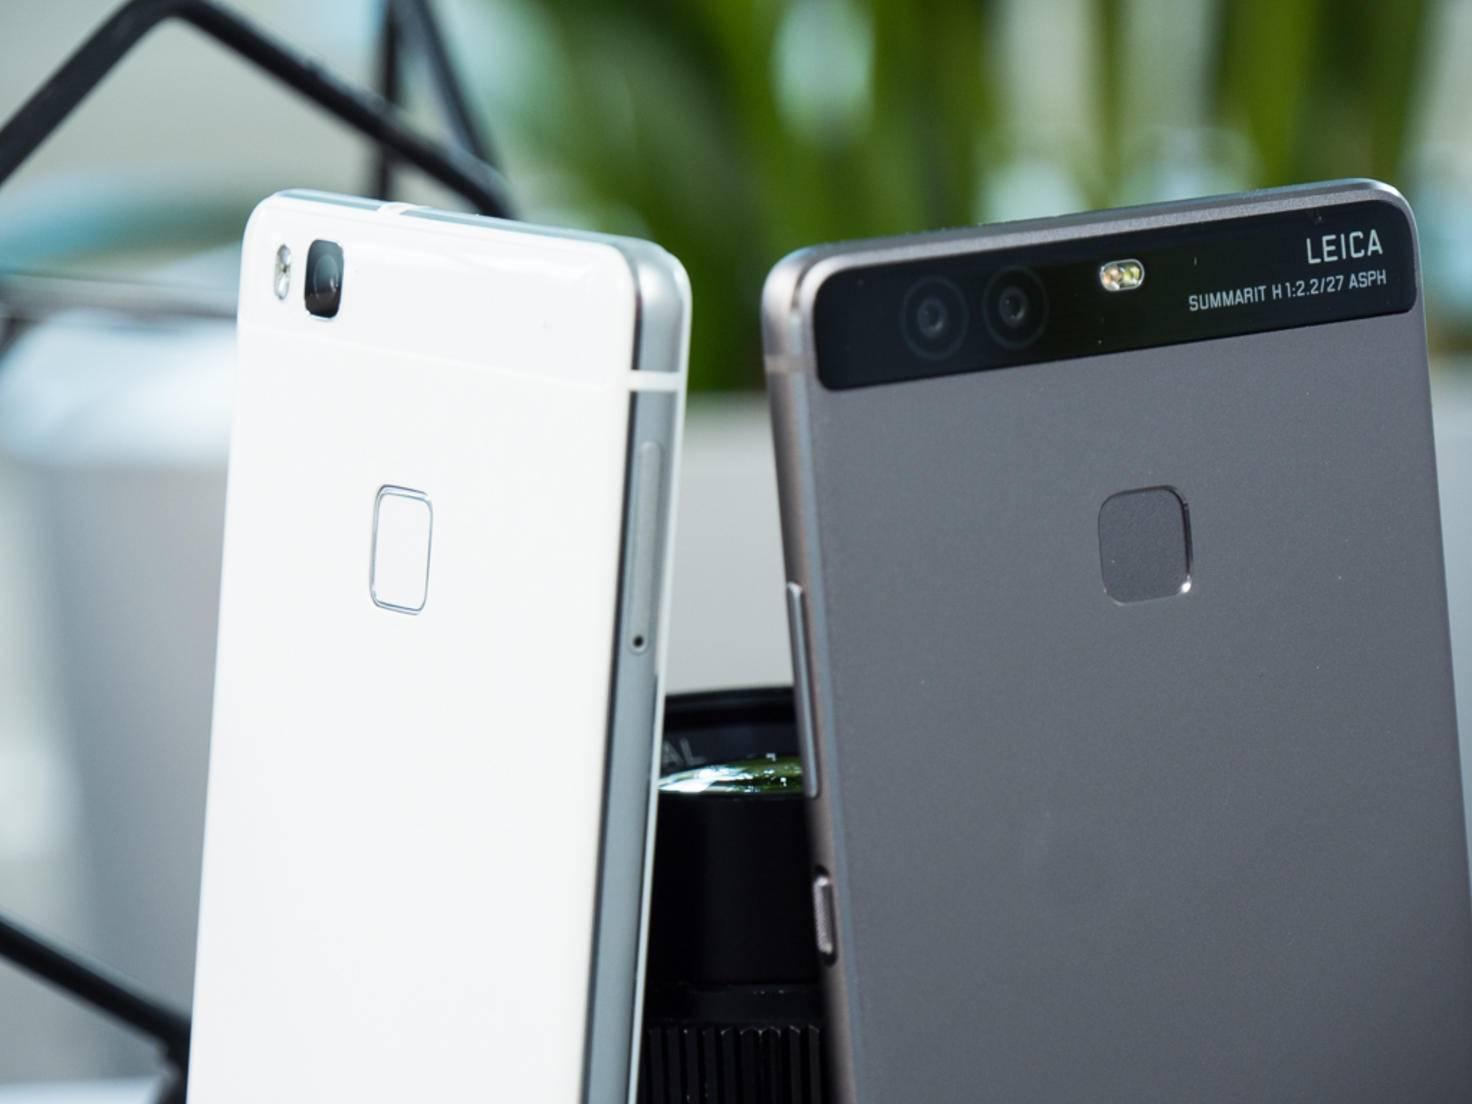 Links: Aluminiumrahmen plus Kunststoffrückseite. Rechts: Unibody aus Metall.